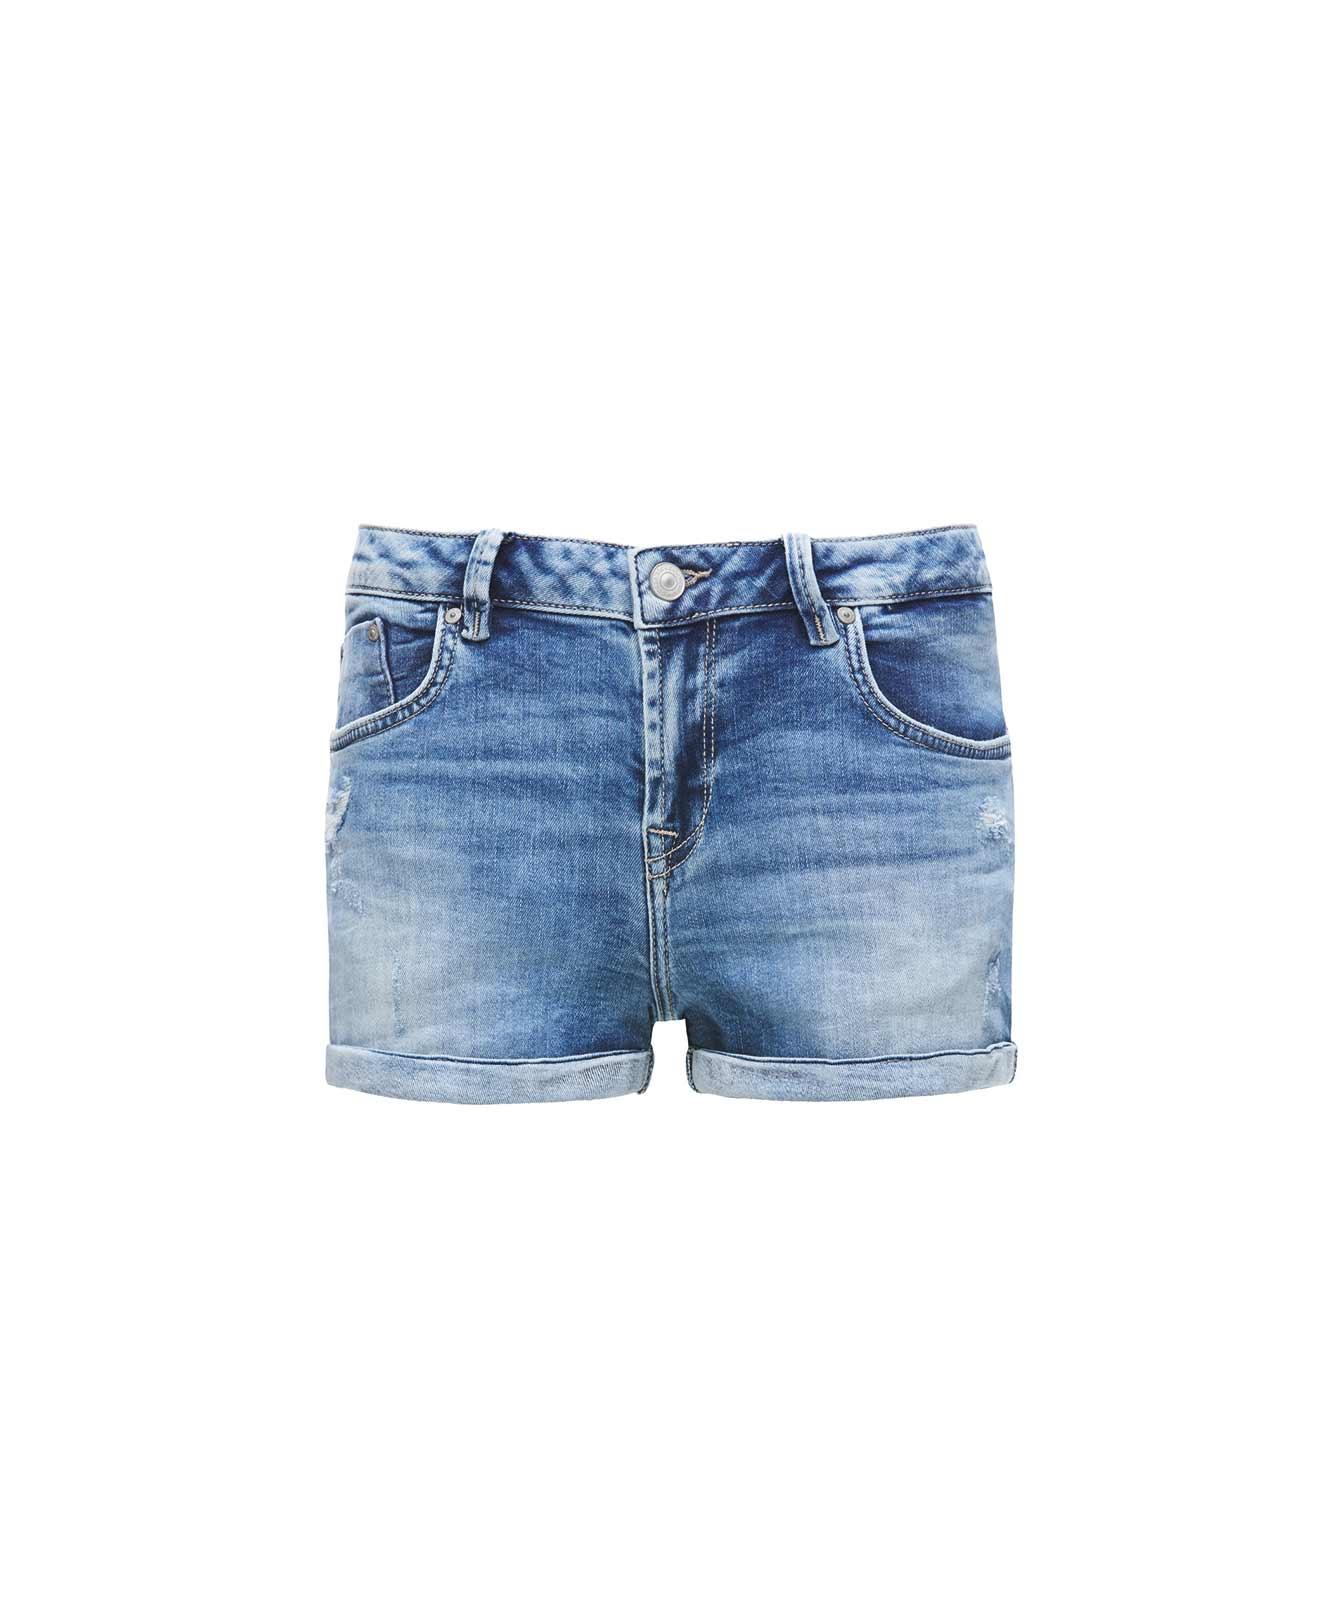 Hosen - LTB Jeans Shorts Judie in Leora  - Onlineshop Jeans Meile